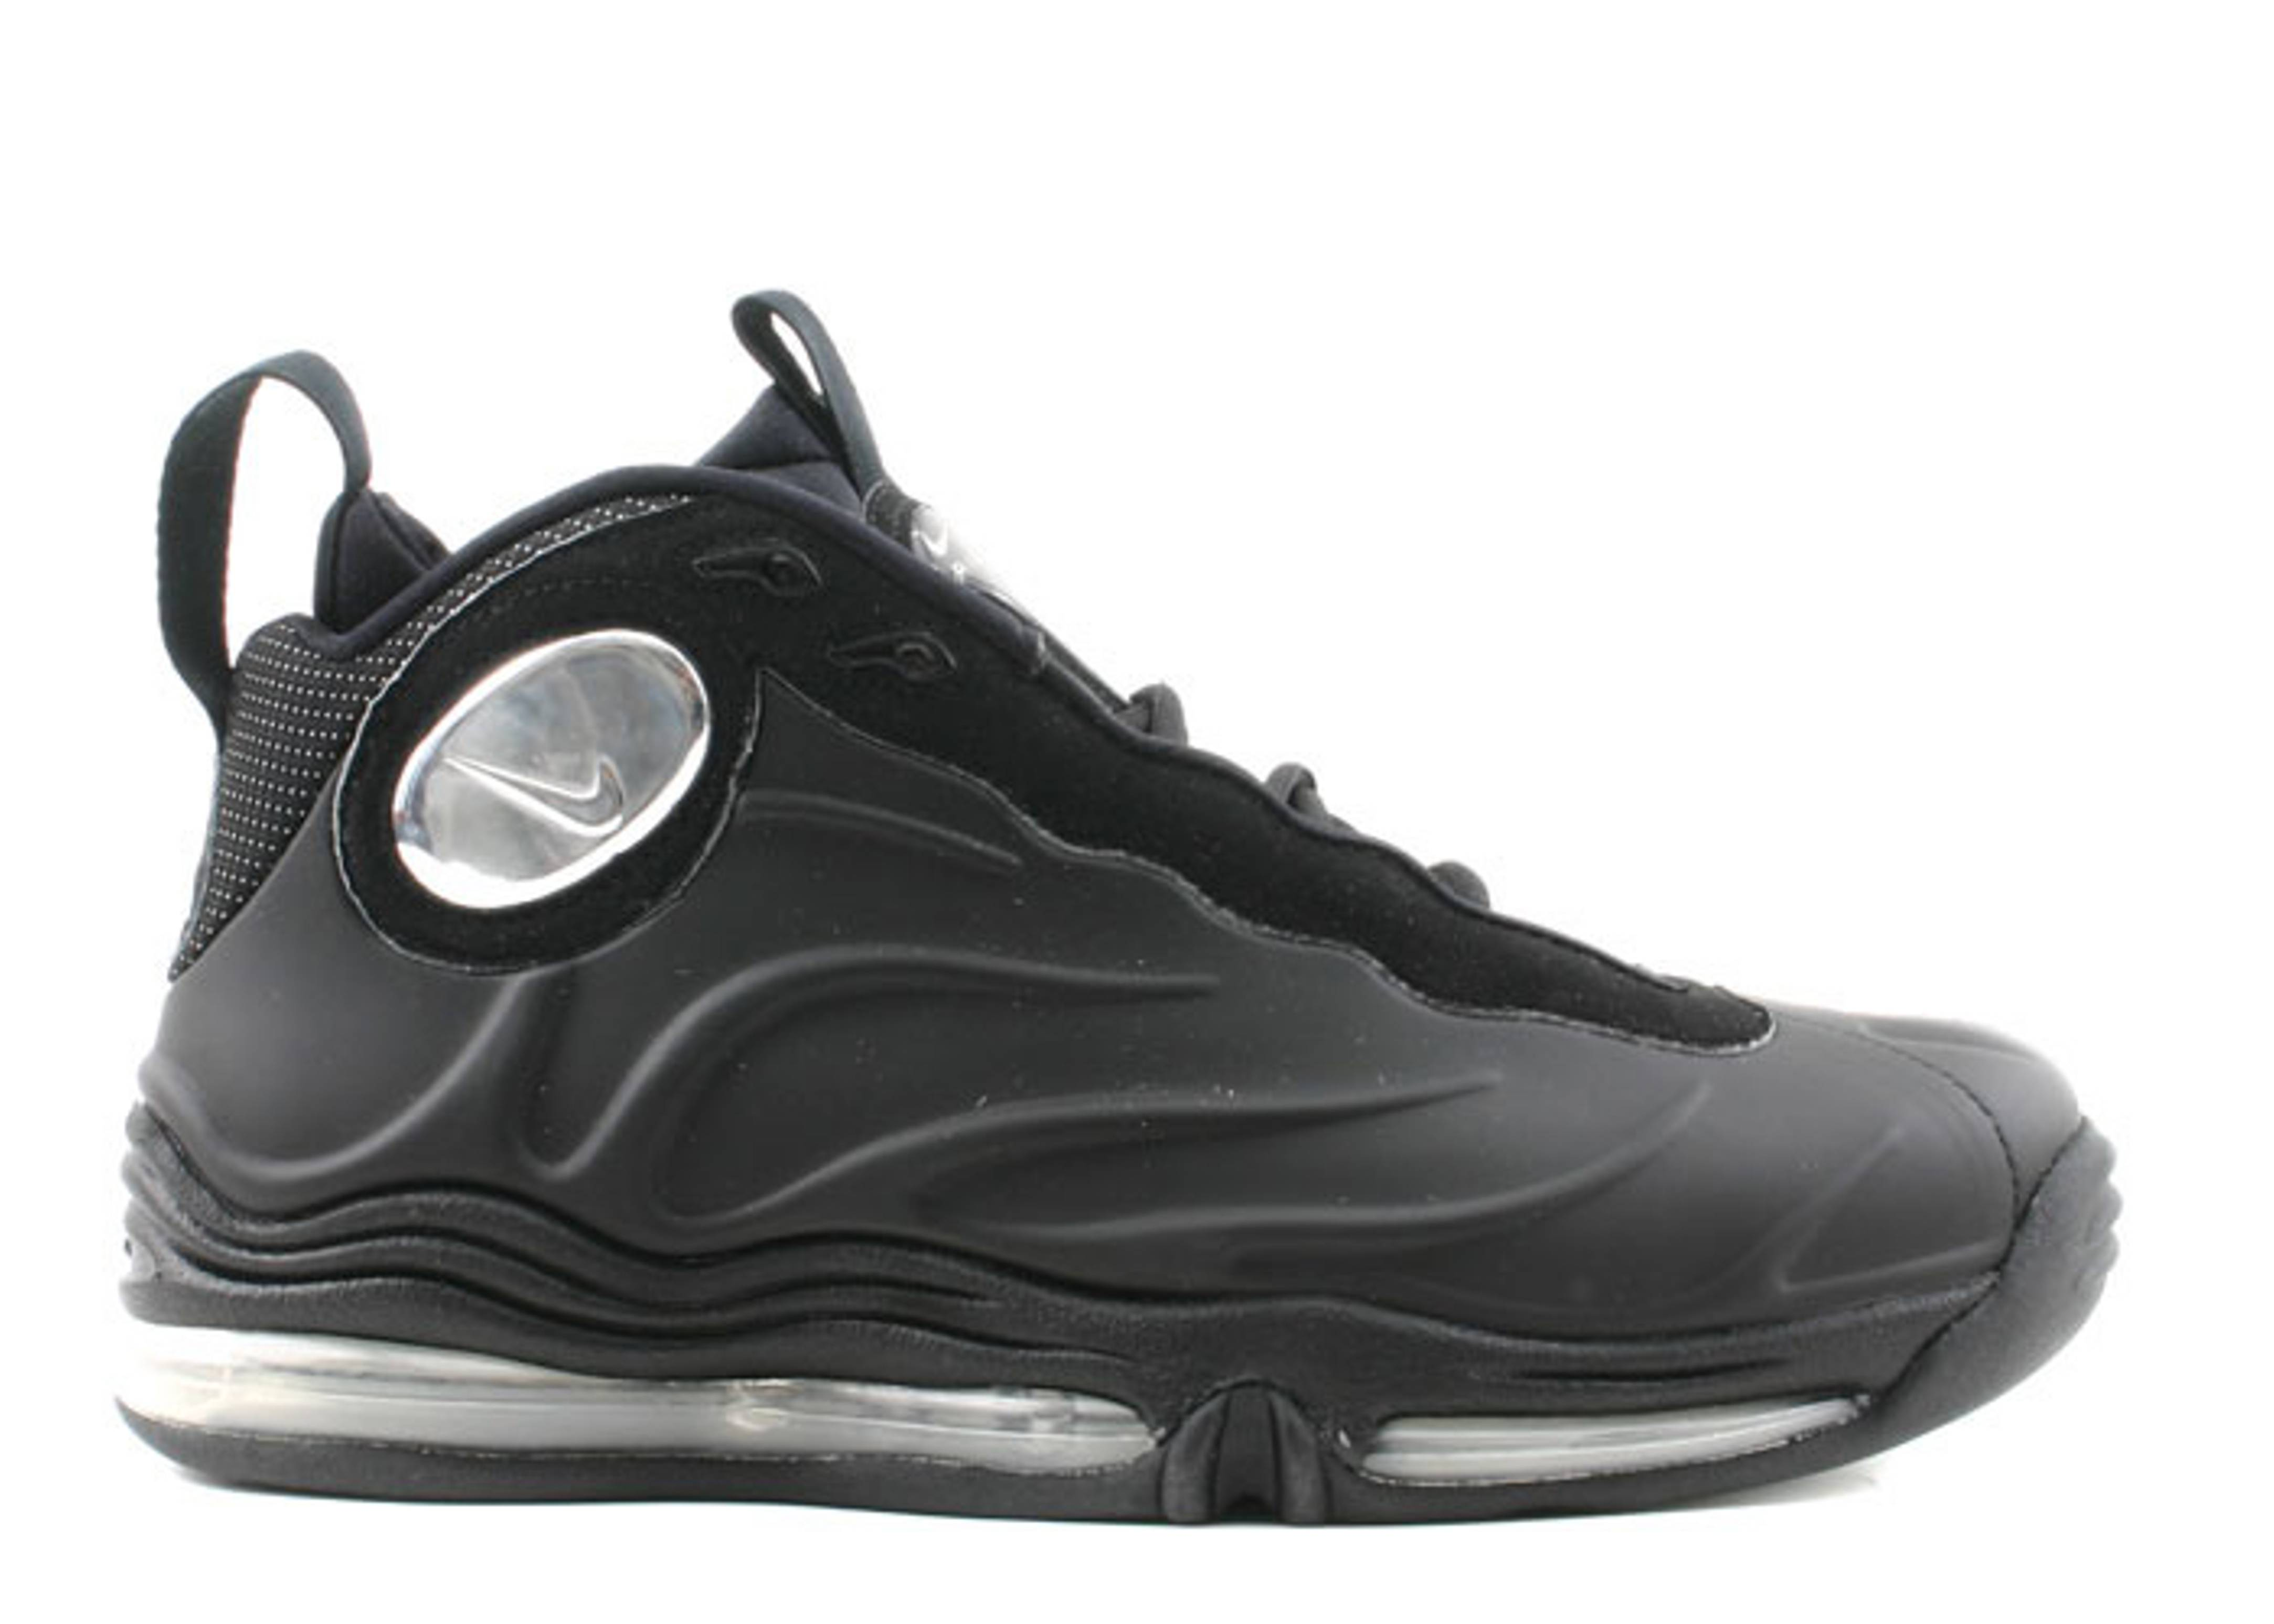 premium selection 46555 bf057 Total Air Foamposite Max - Nike - 307717 001 - black metallic silver-black    Flight Club